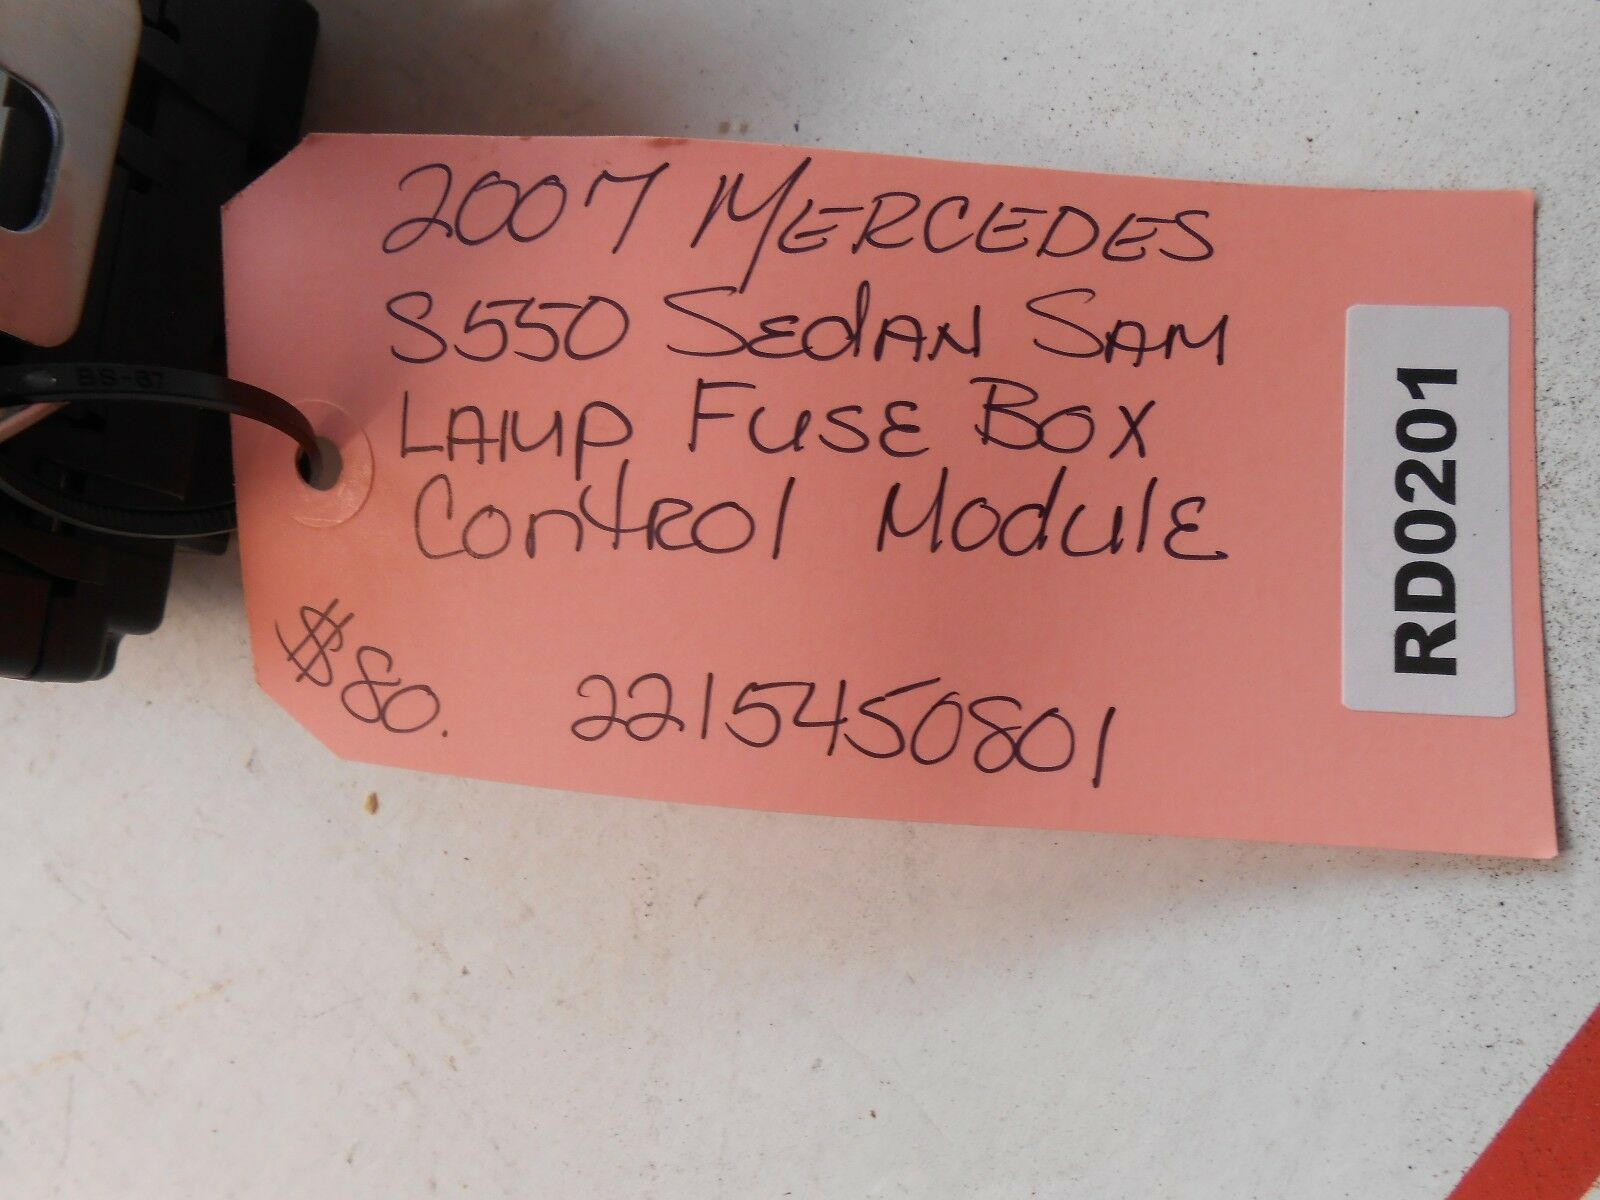 07 Mercedes S550 Sedan Sam Lamp Fuse Box Control Mod 2215450801 Rd0201 Ebay